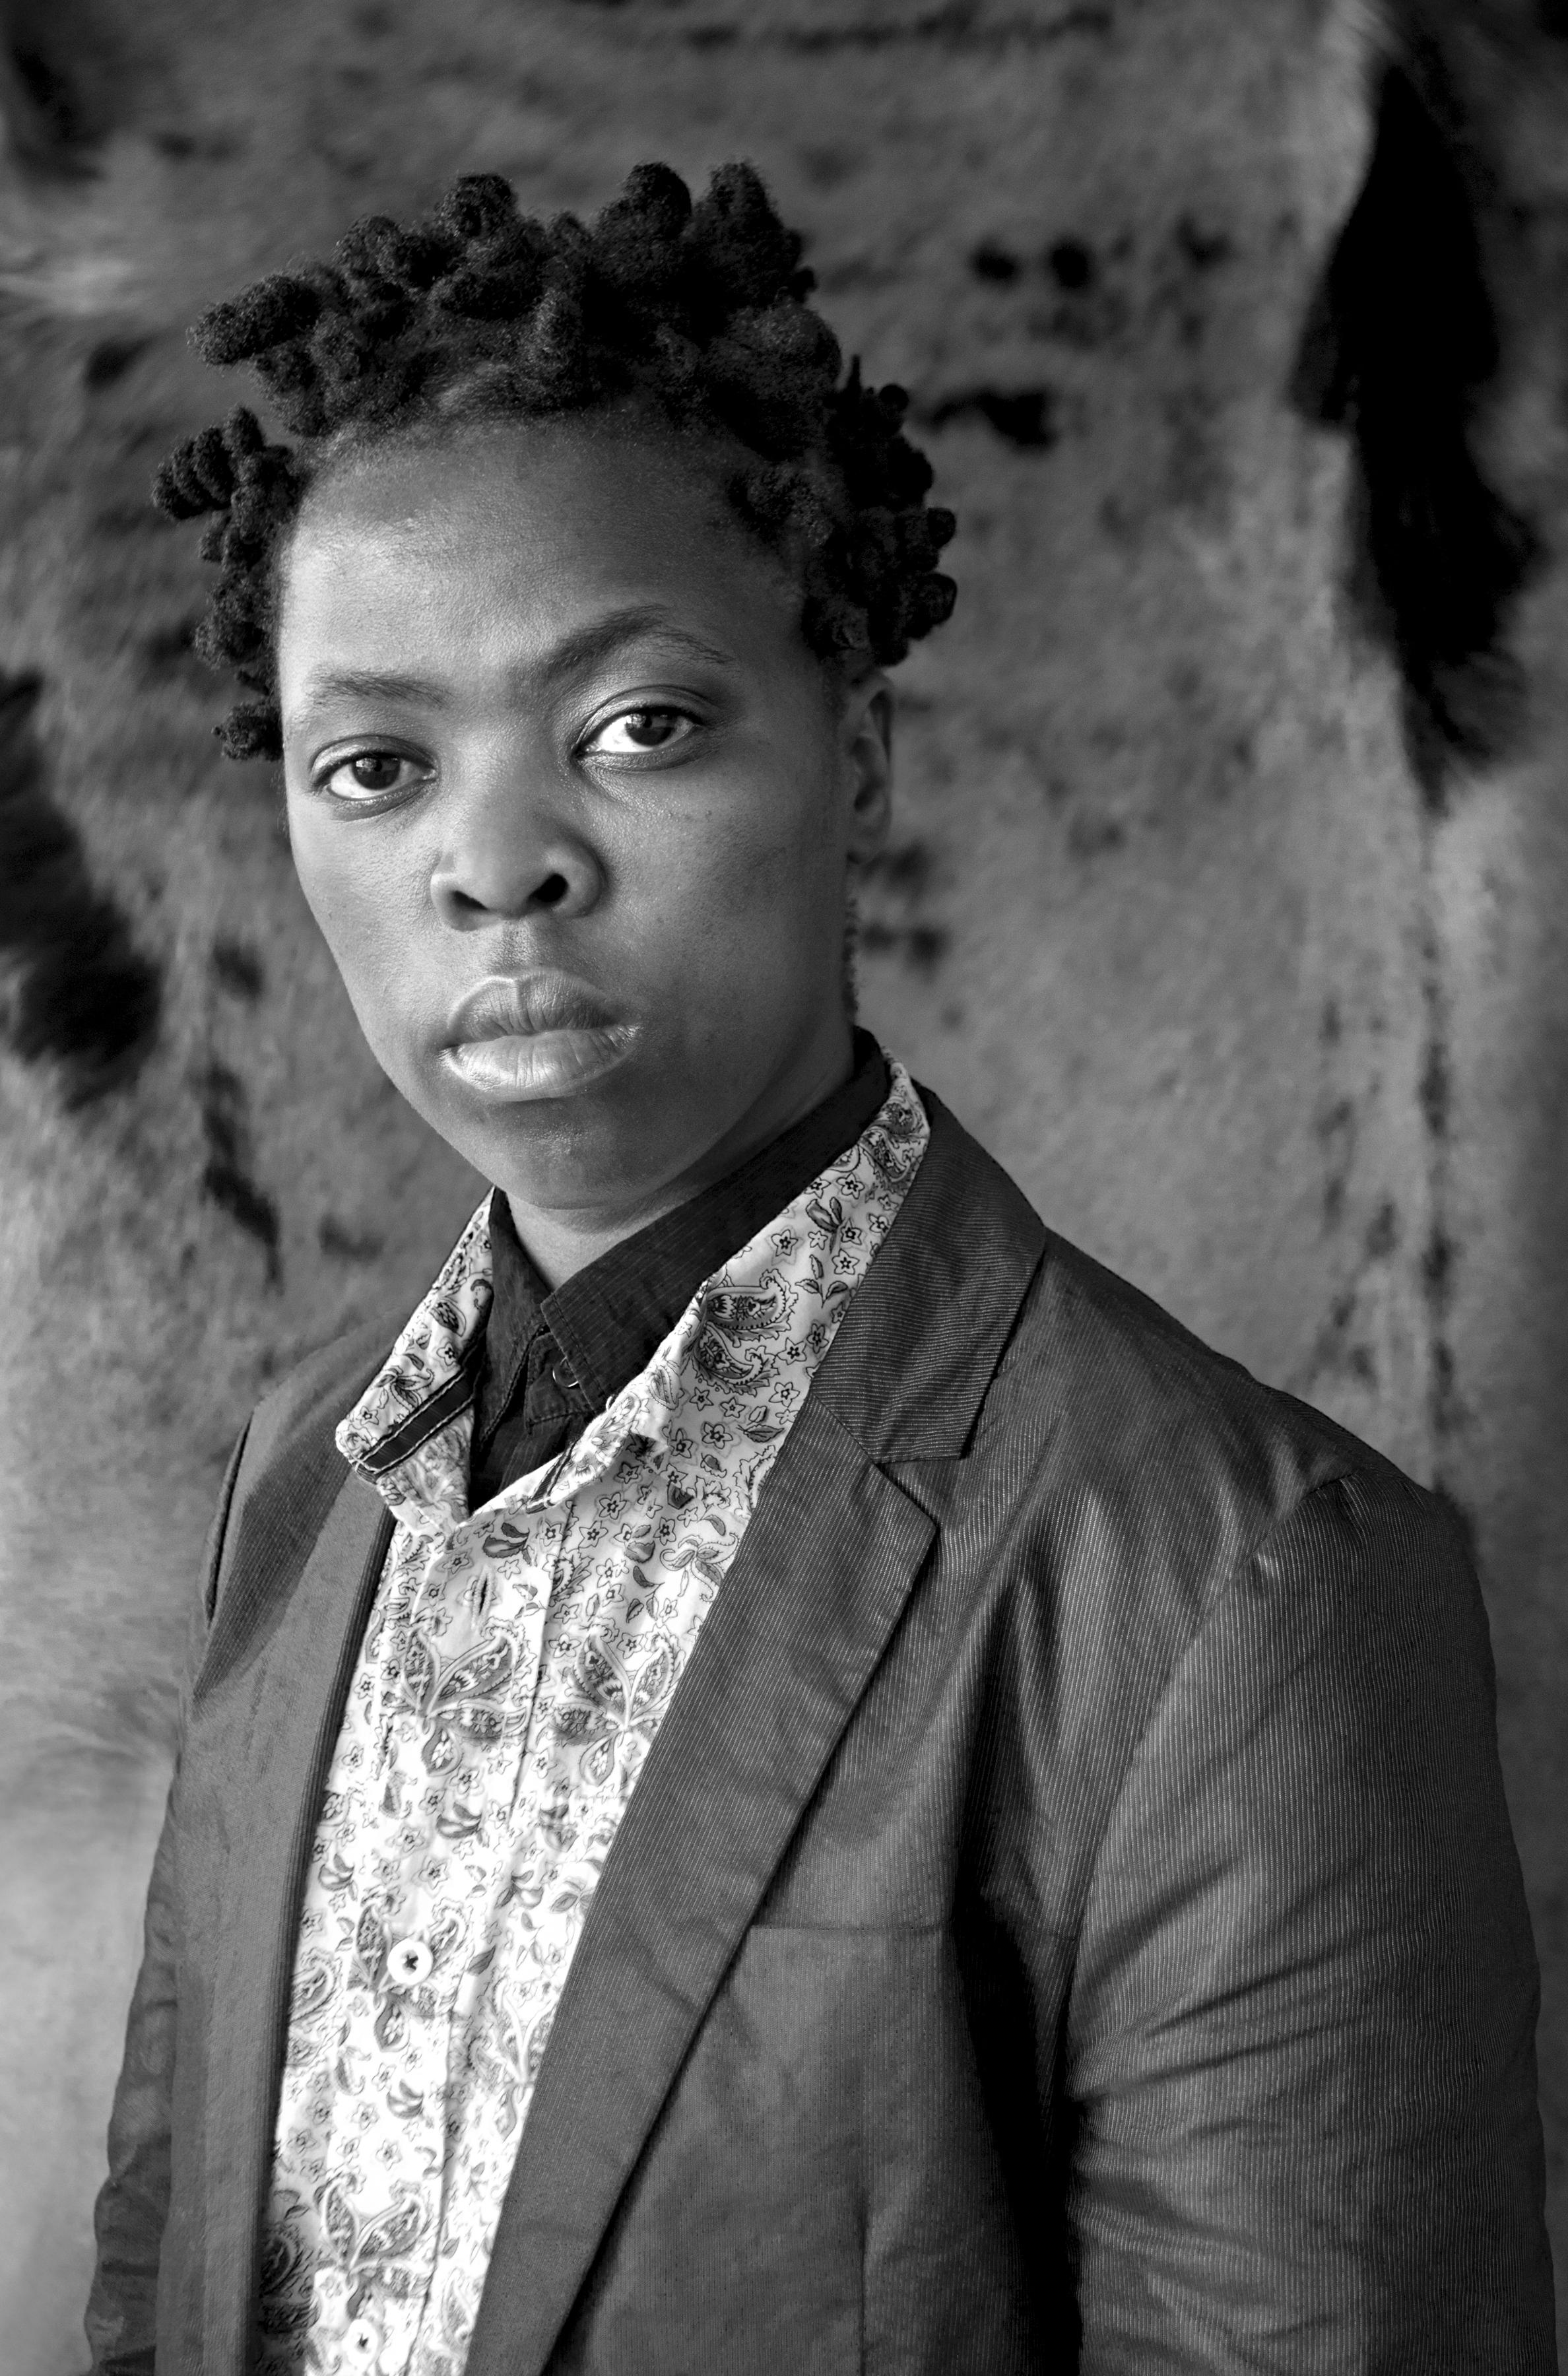 Portrait by Zanele Muholi. All images courtesy of the artist